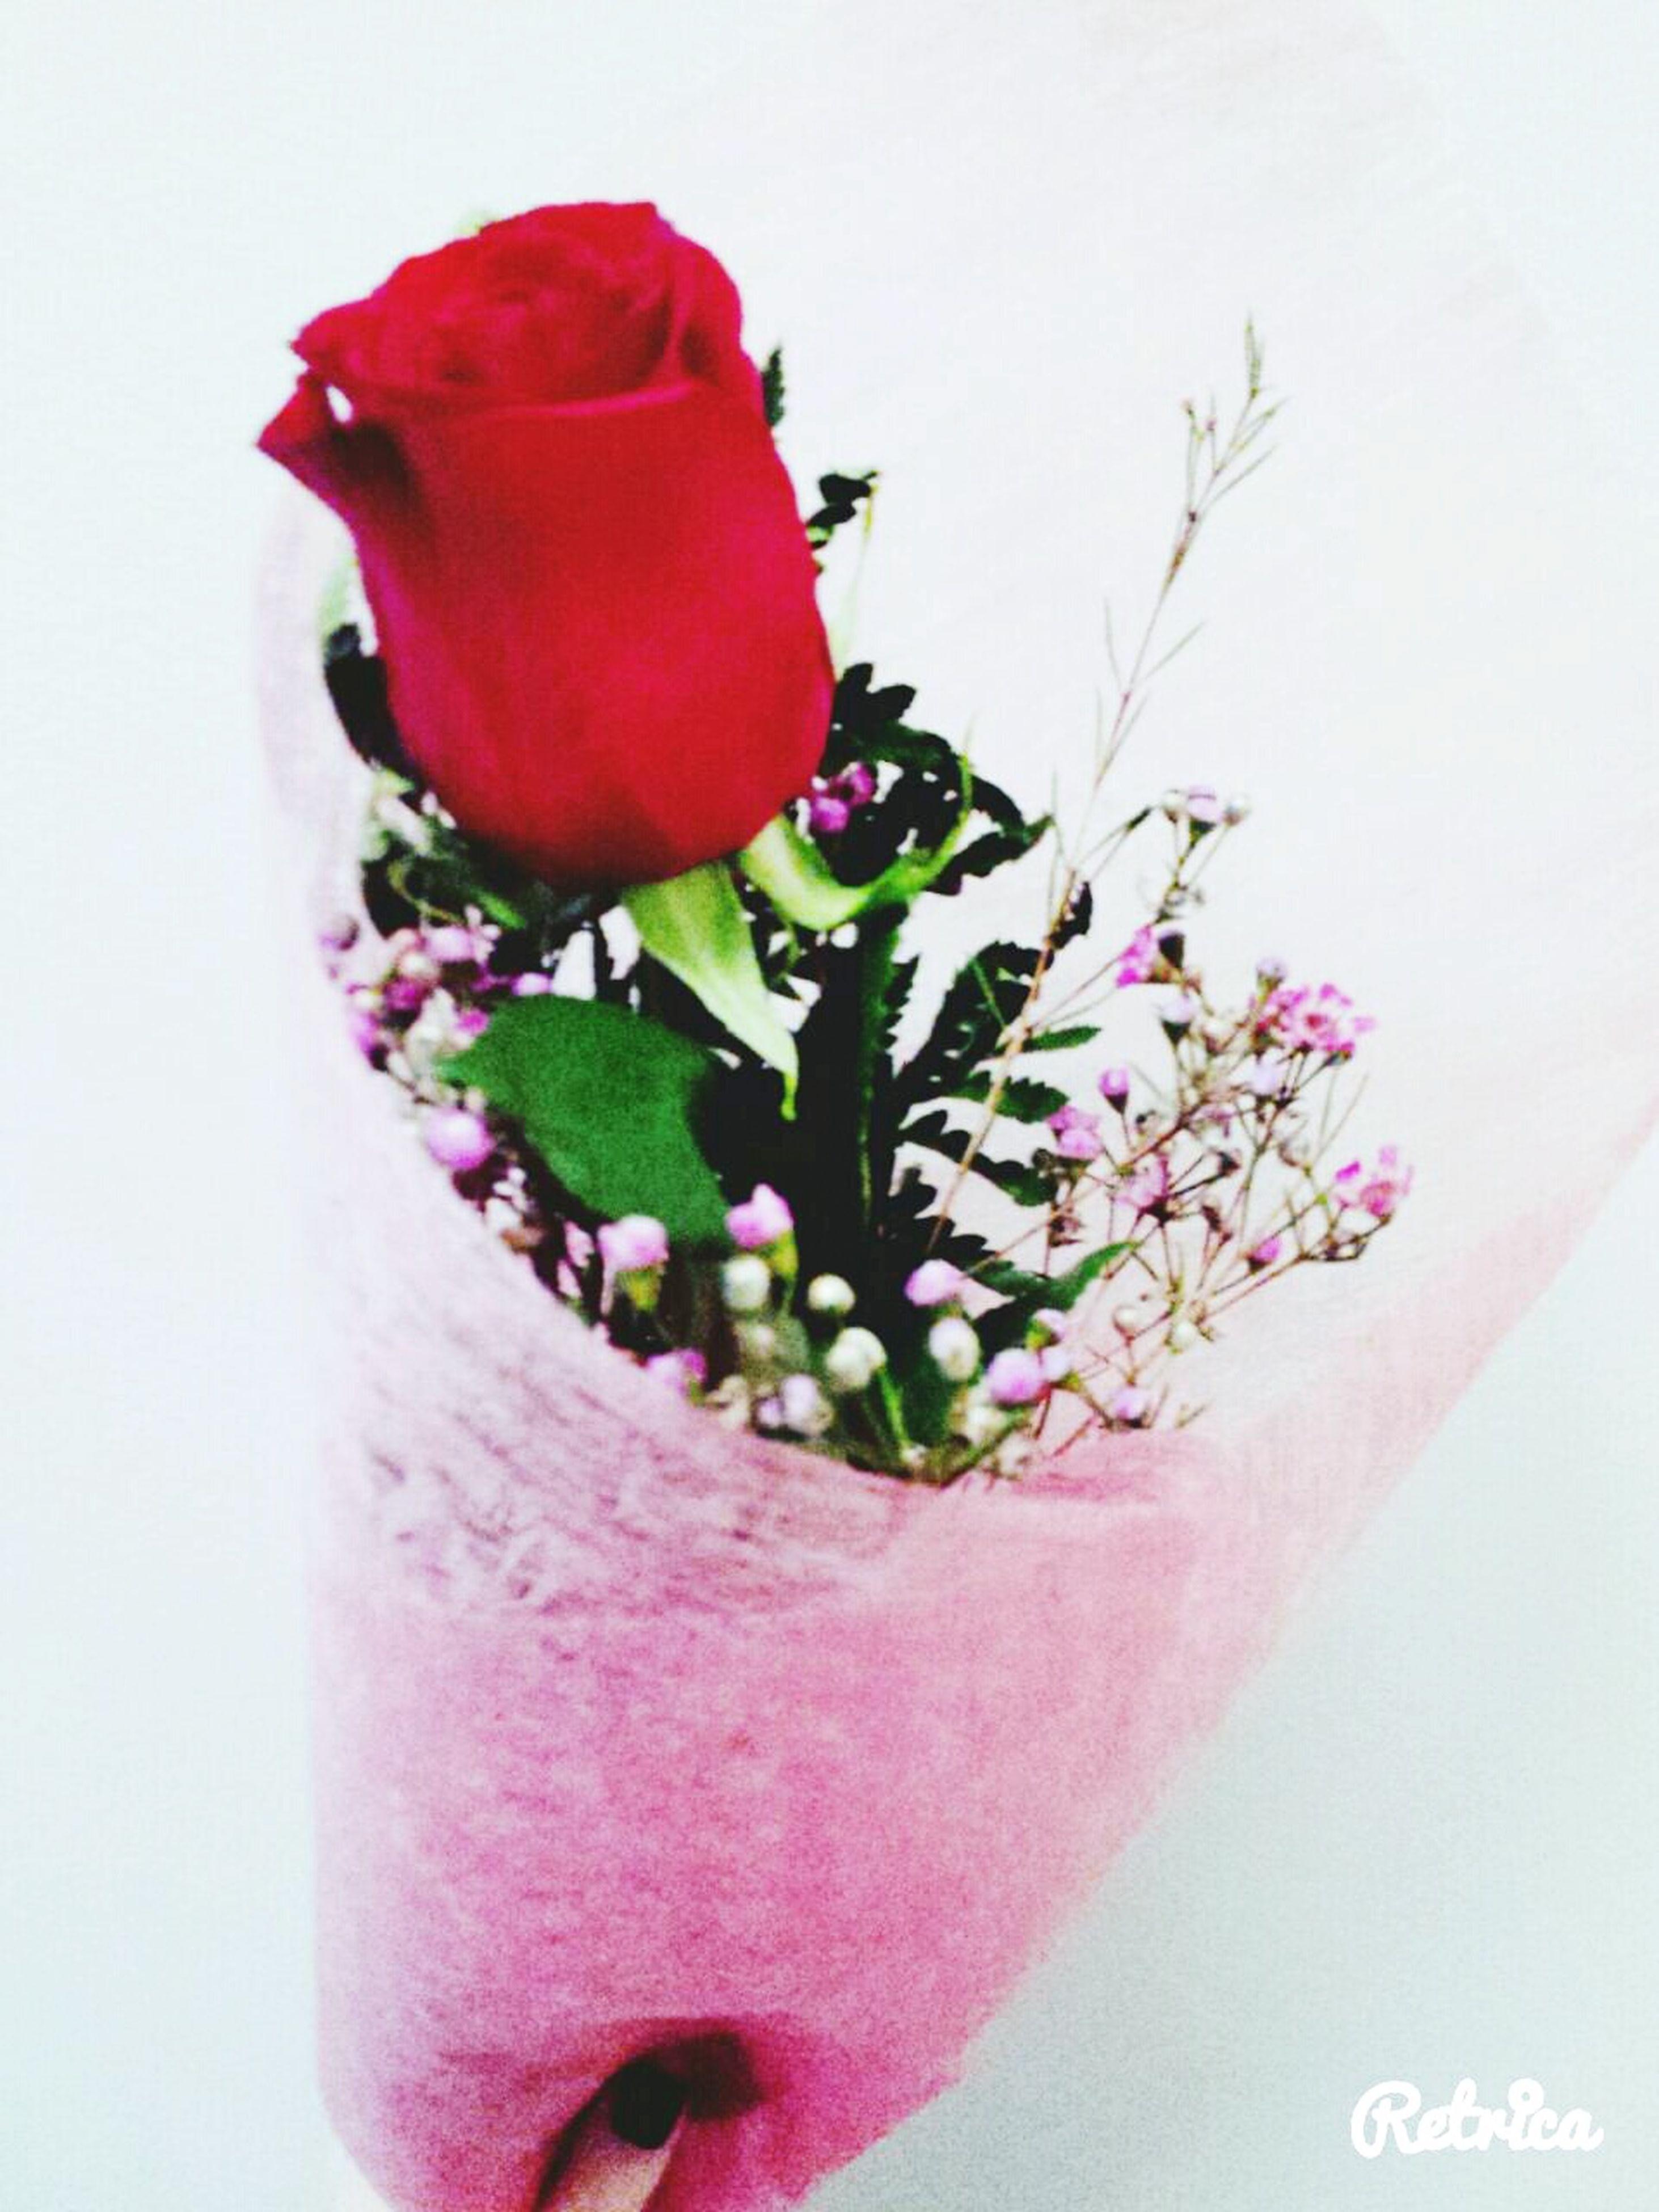 flower, white background, freshness, petal, studio shot, red, fragility, indoors, close-up, flower head, rose - flower, vase, stem, rose, pink color, plant, single flower, beauty in nature, leaf, wall - building feature